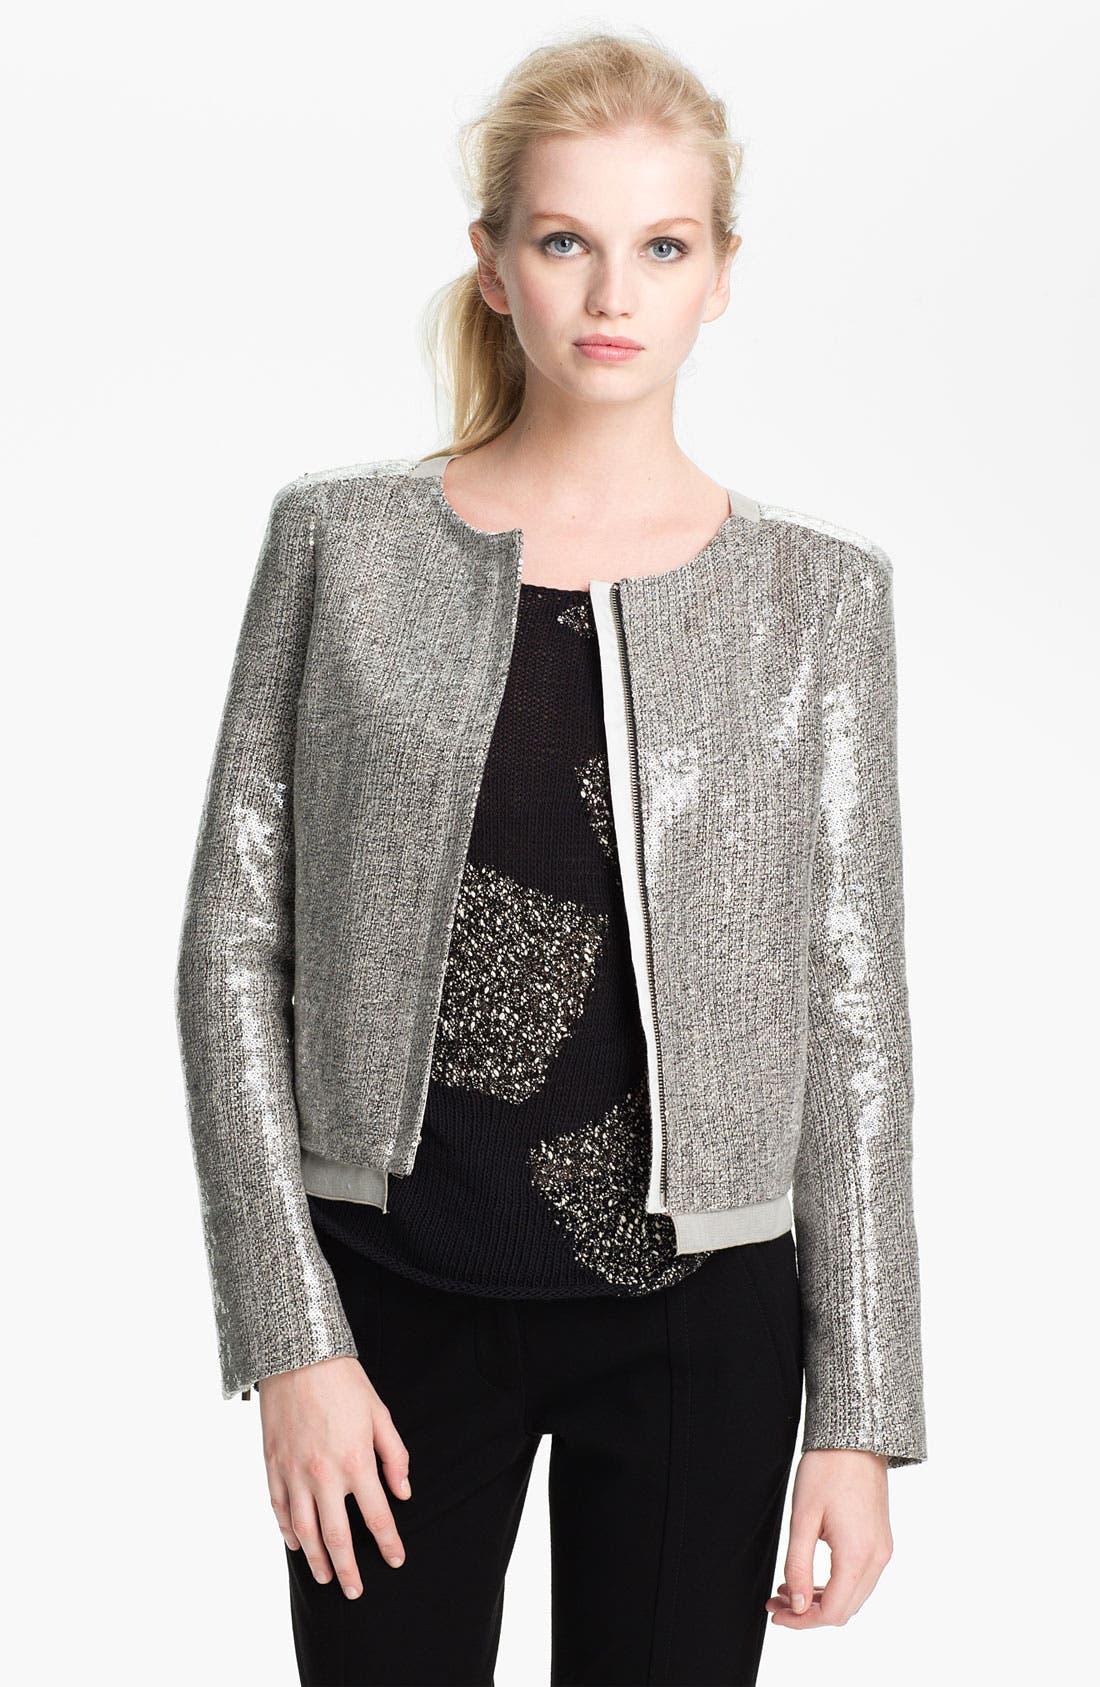 Alternate Image 1 Selected - Diane von Furstenberg 'Tamli' Sequin Crop Jacket